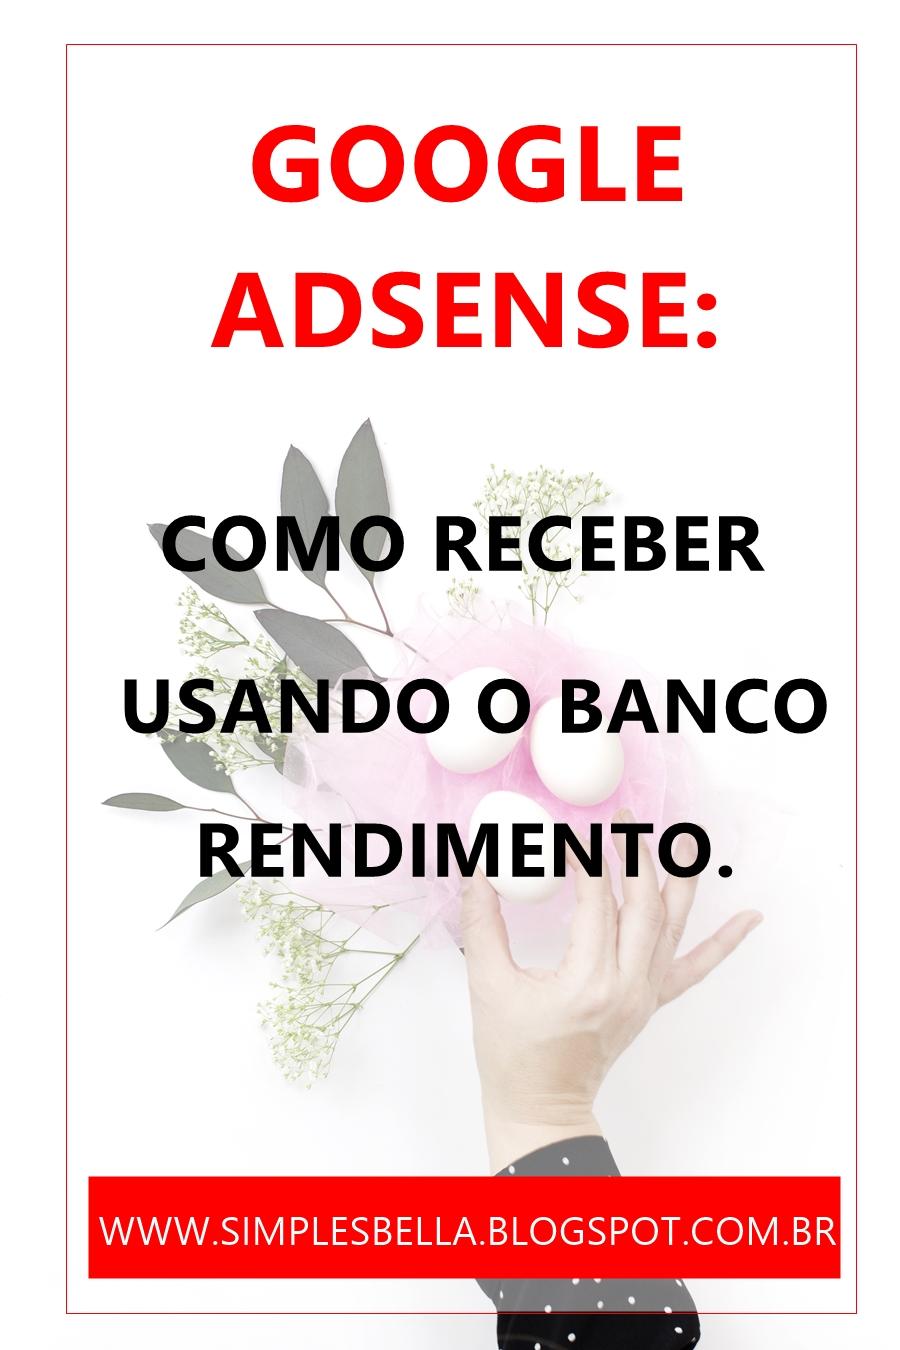 Como receber do Google Adsense pelo Banco Rendimento. Clique e confira!